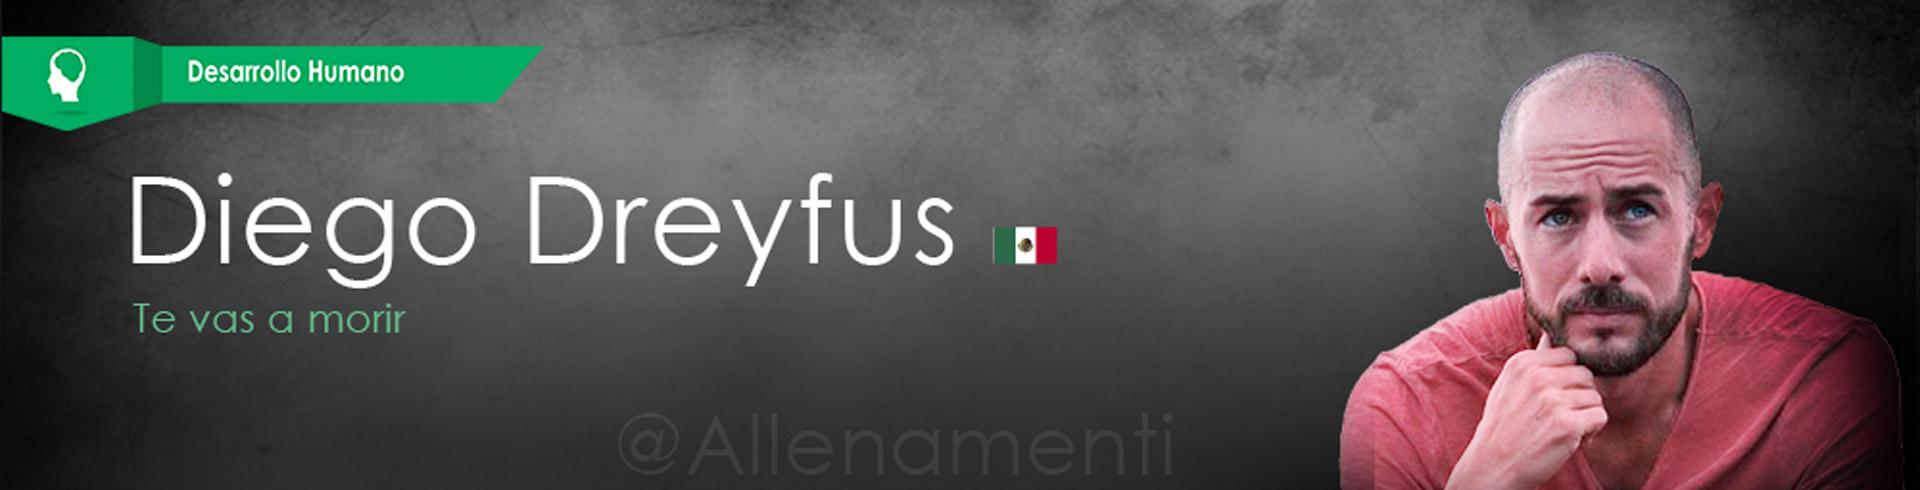 Diego Dreyfus (Semblanza) - Allenamenti Speakers Bureau